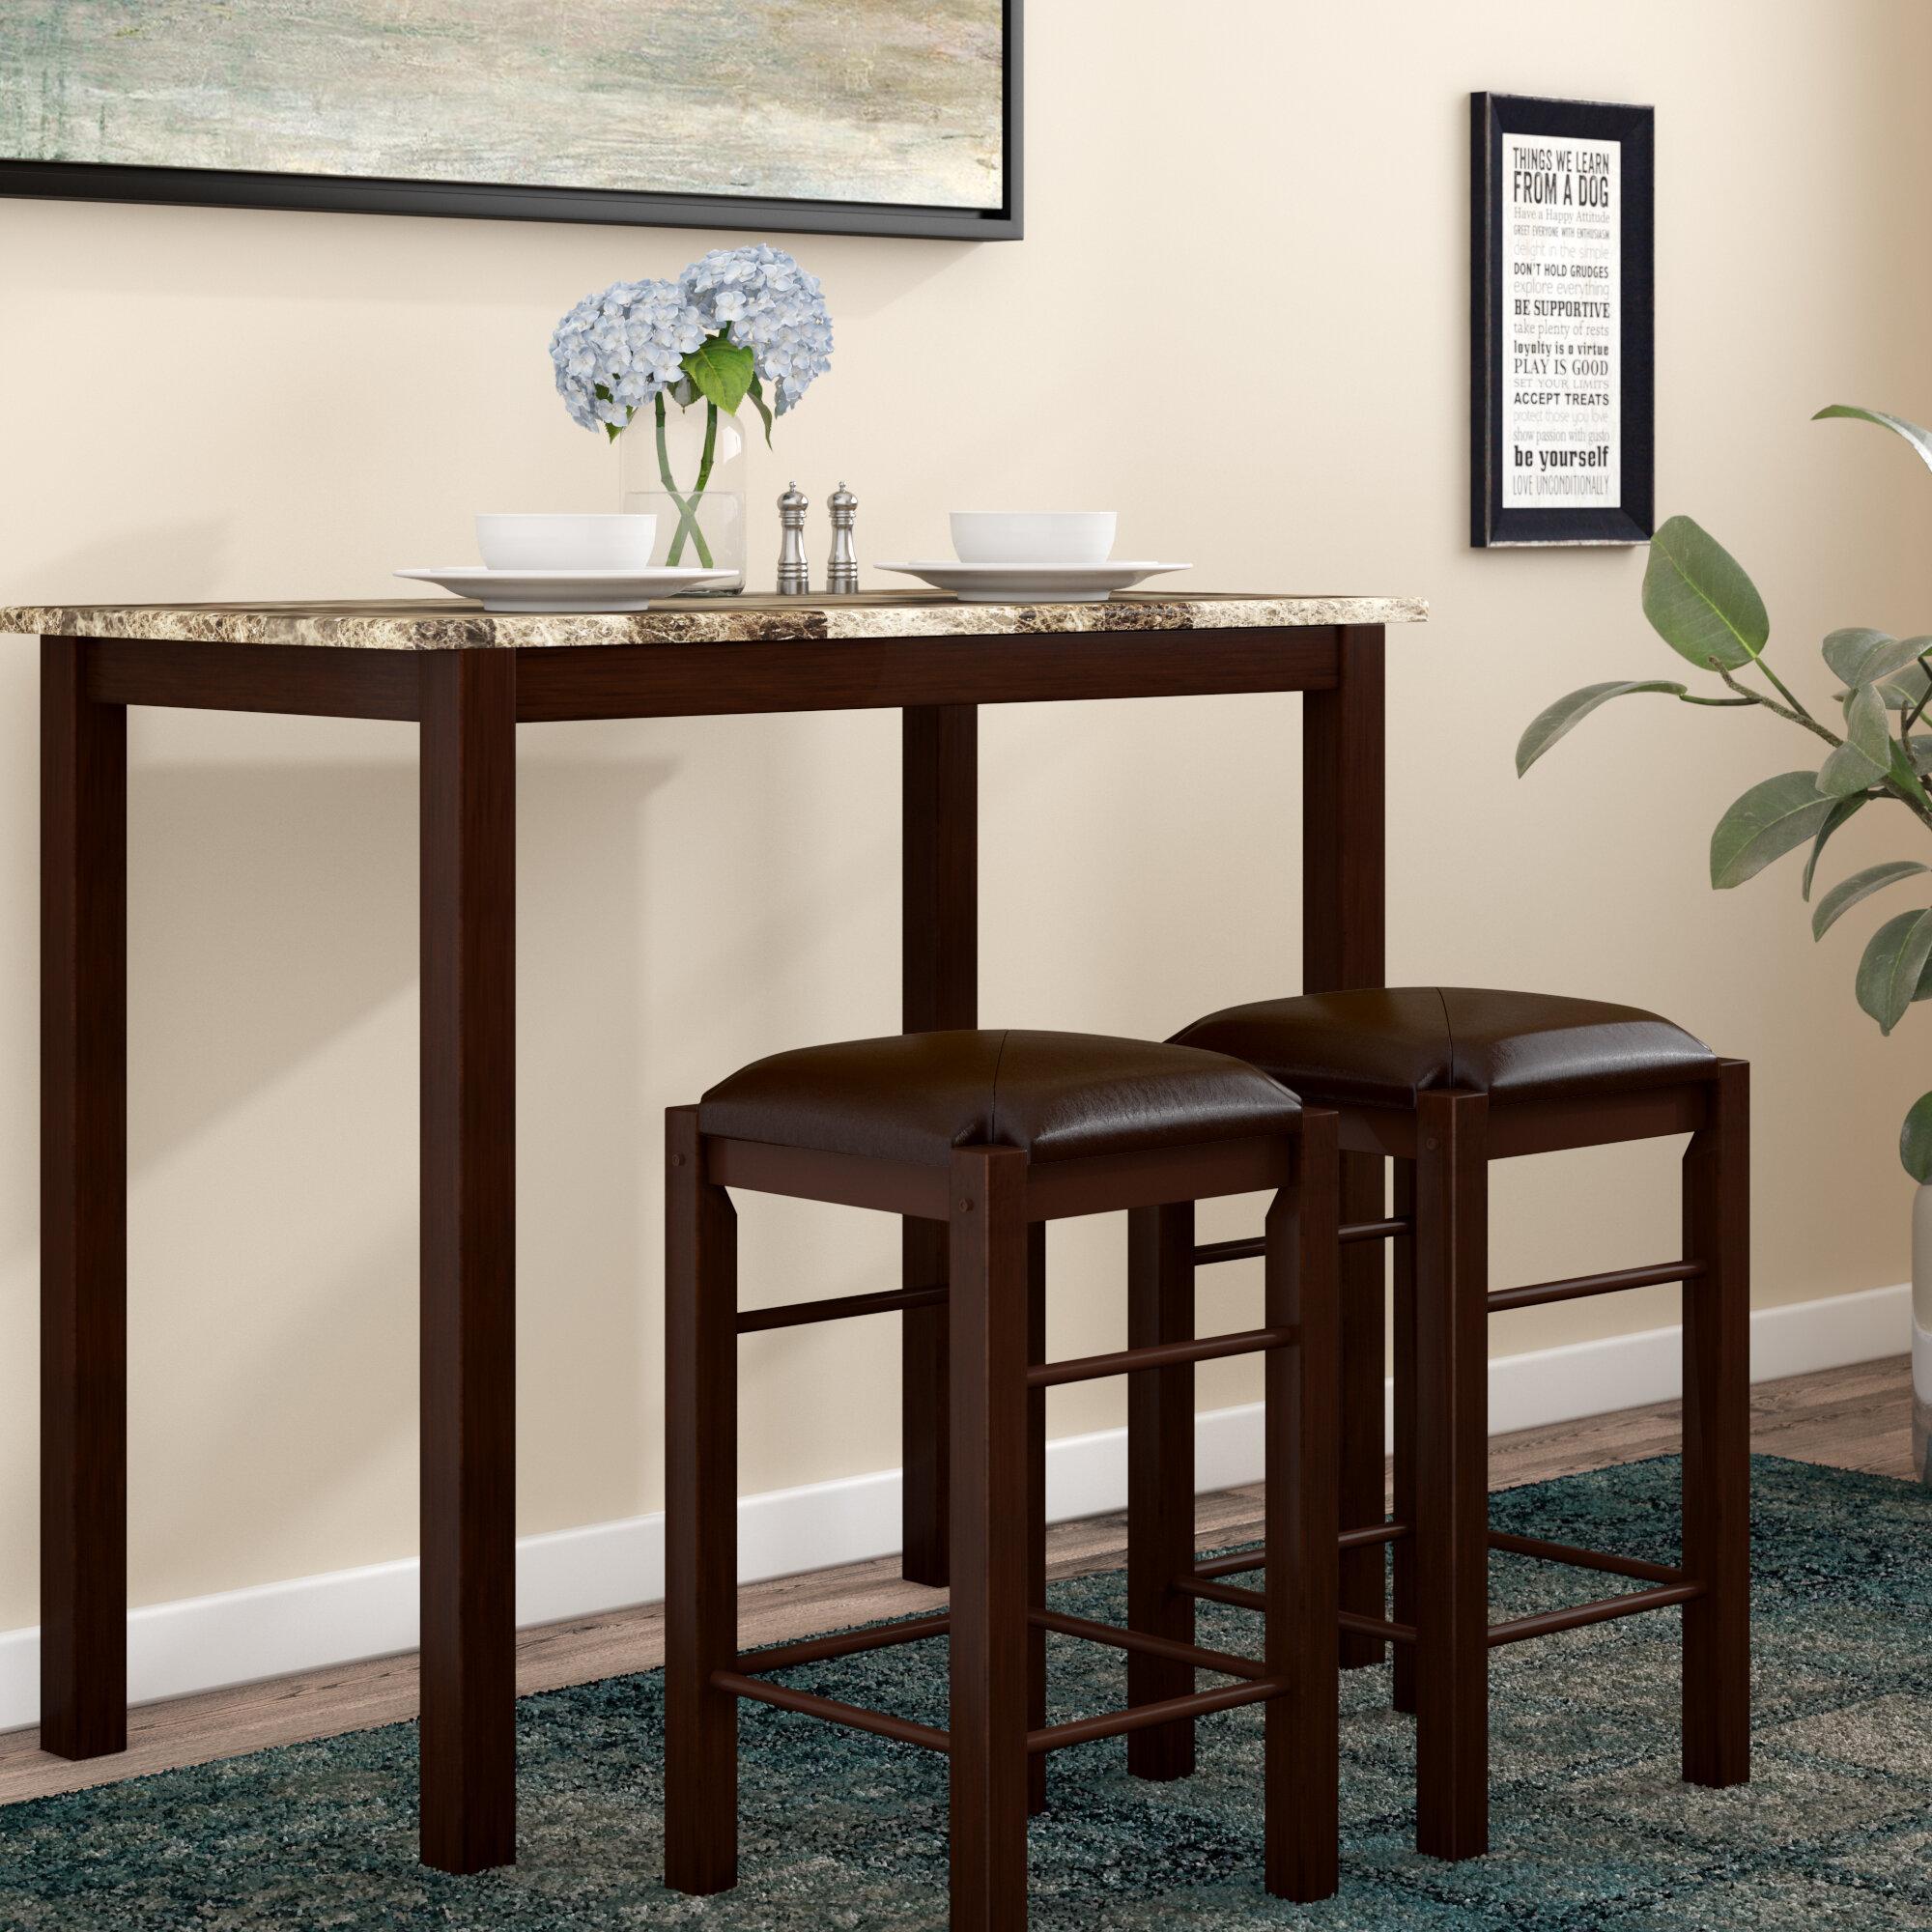 Merveilleux Penelope 3 Piece Counter Height Wood Dining Set